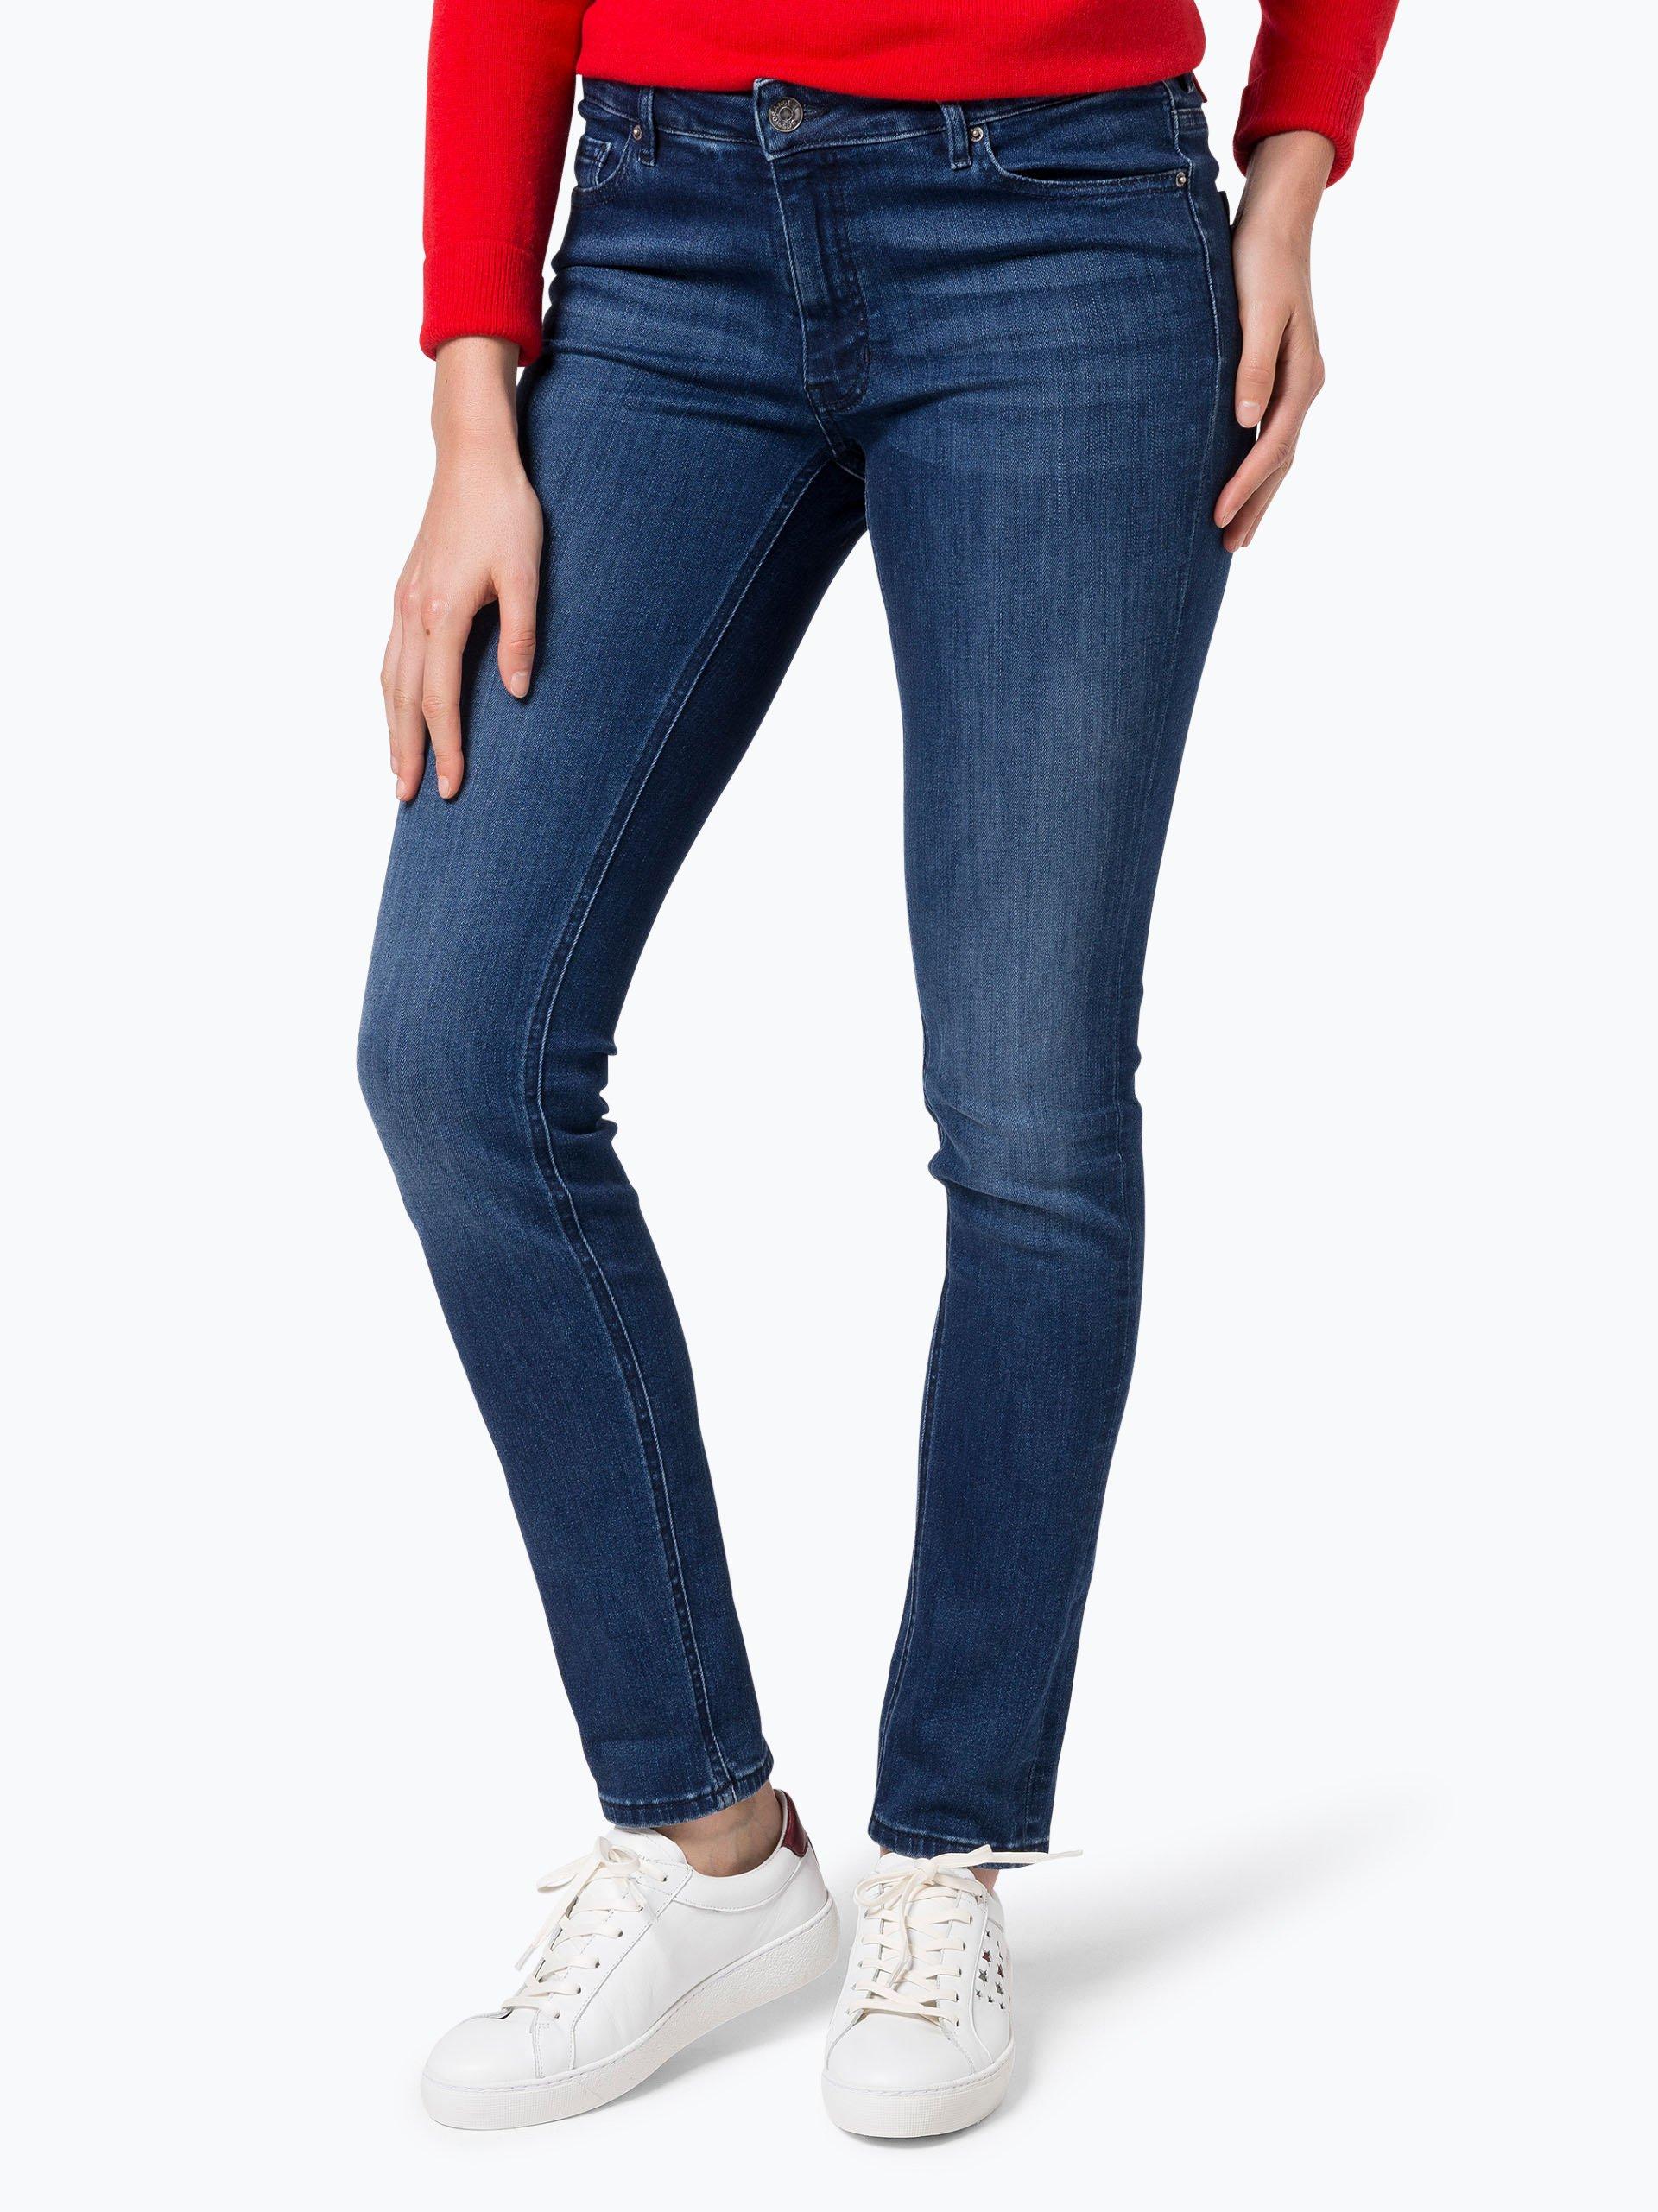 boss casual damen jeans orange j20 online kaufen peek. Black Bedroom Furniture Sets. Home Design Ideas